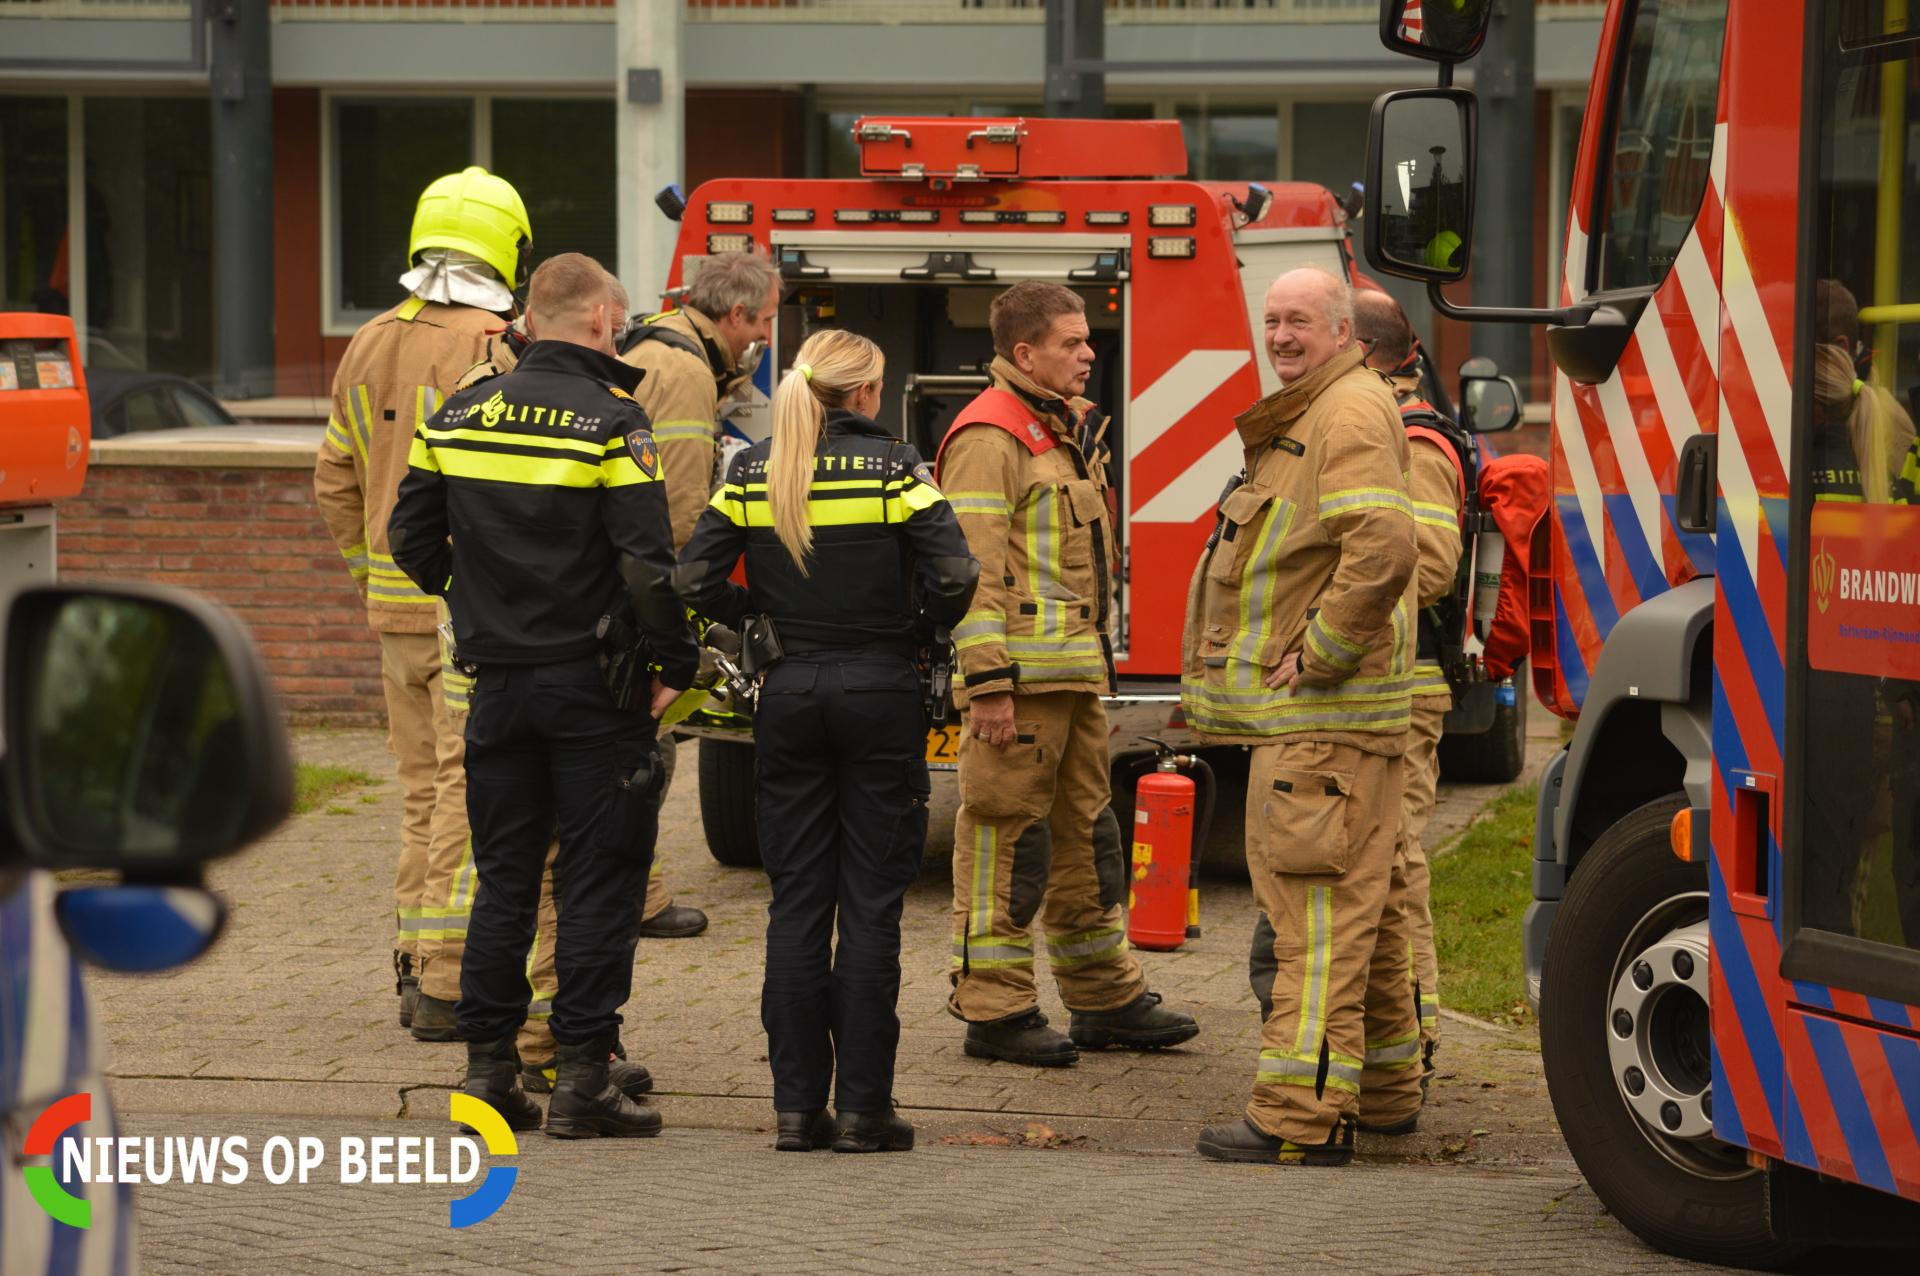 Brandweer blust vuur in pannetje Muiderstraat Berkel en Rodenrijs